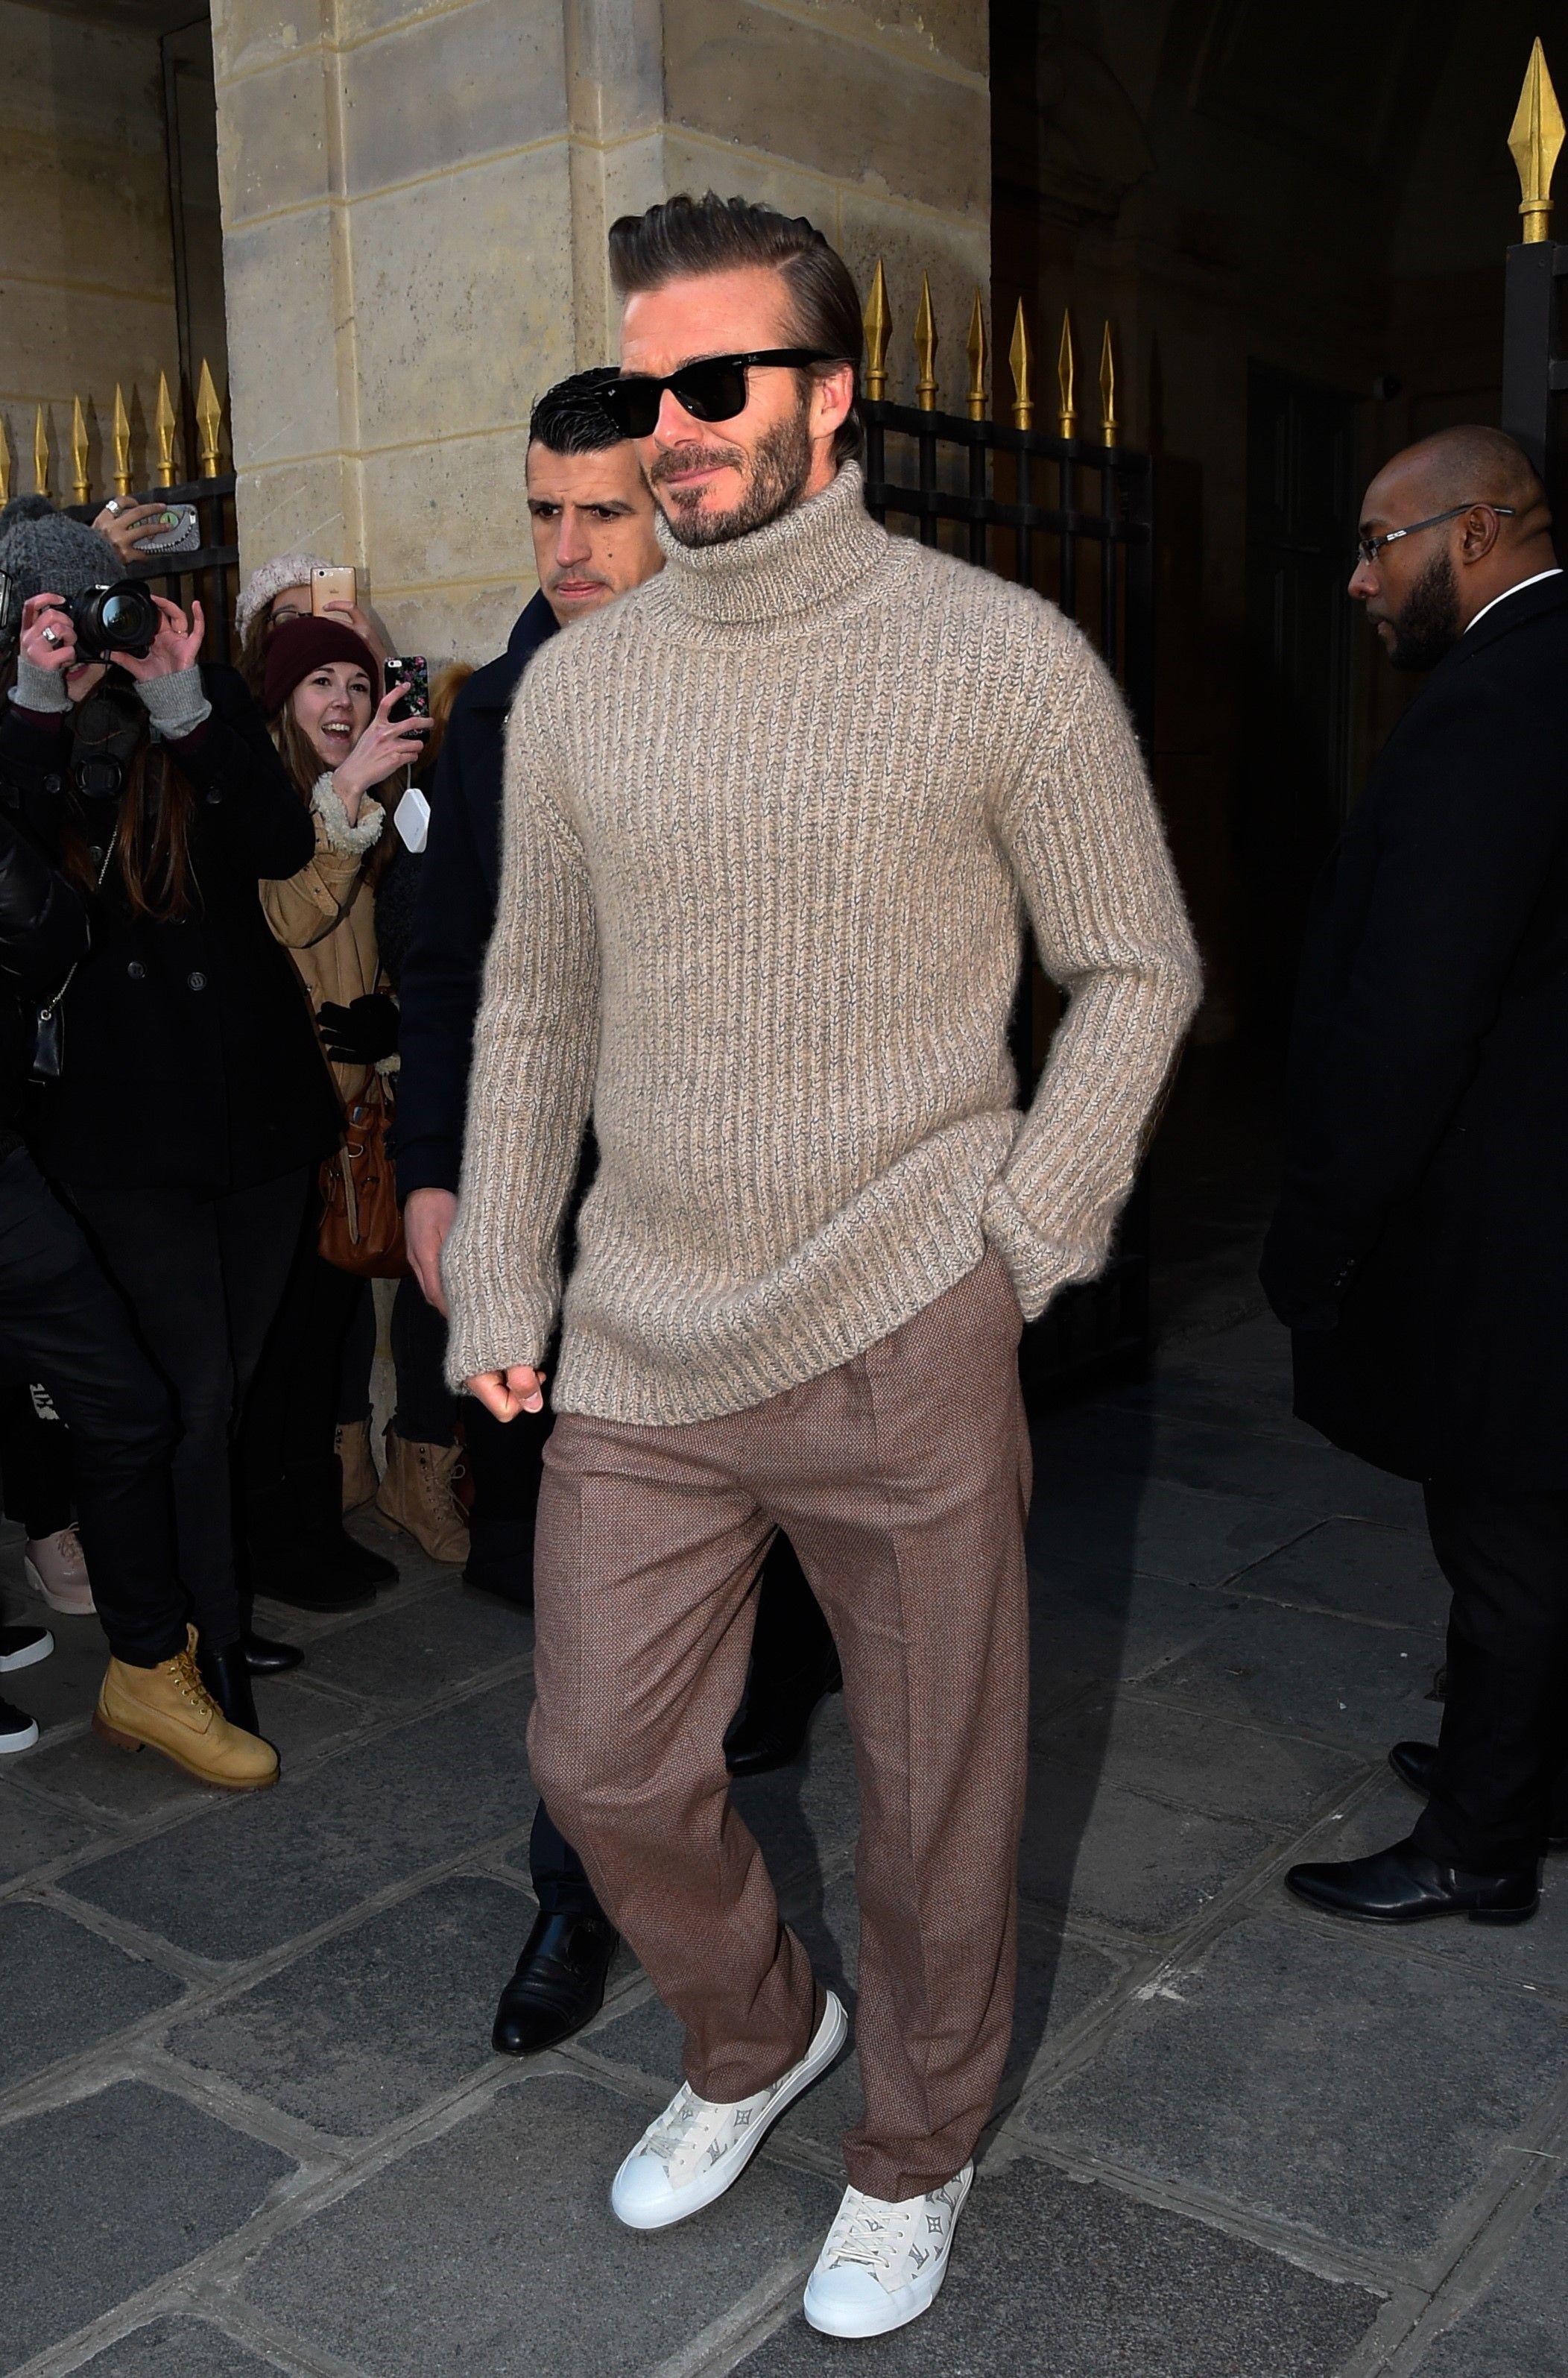 dd73e9dcaf3e David Beckham wearing Ray-Ban Original Wayfarer Acetate Sunglasses